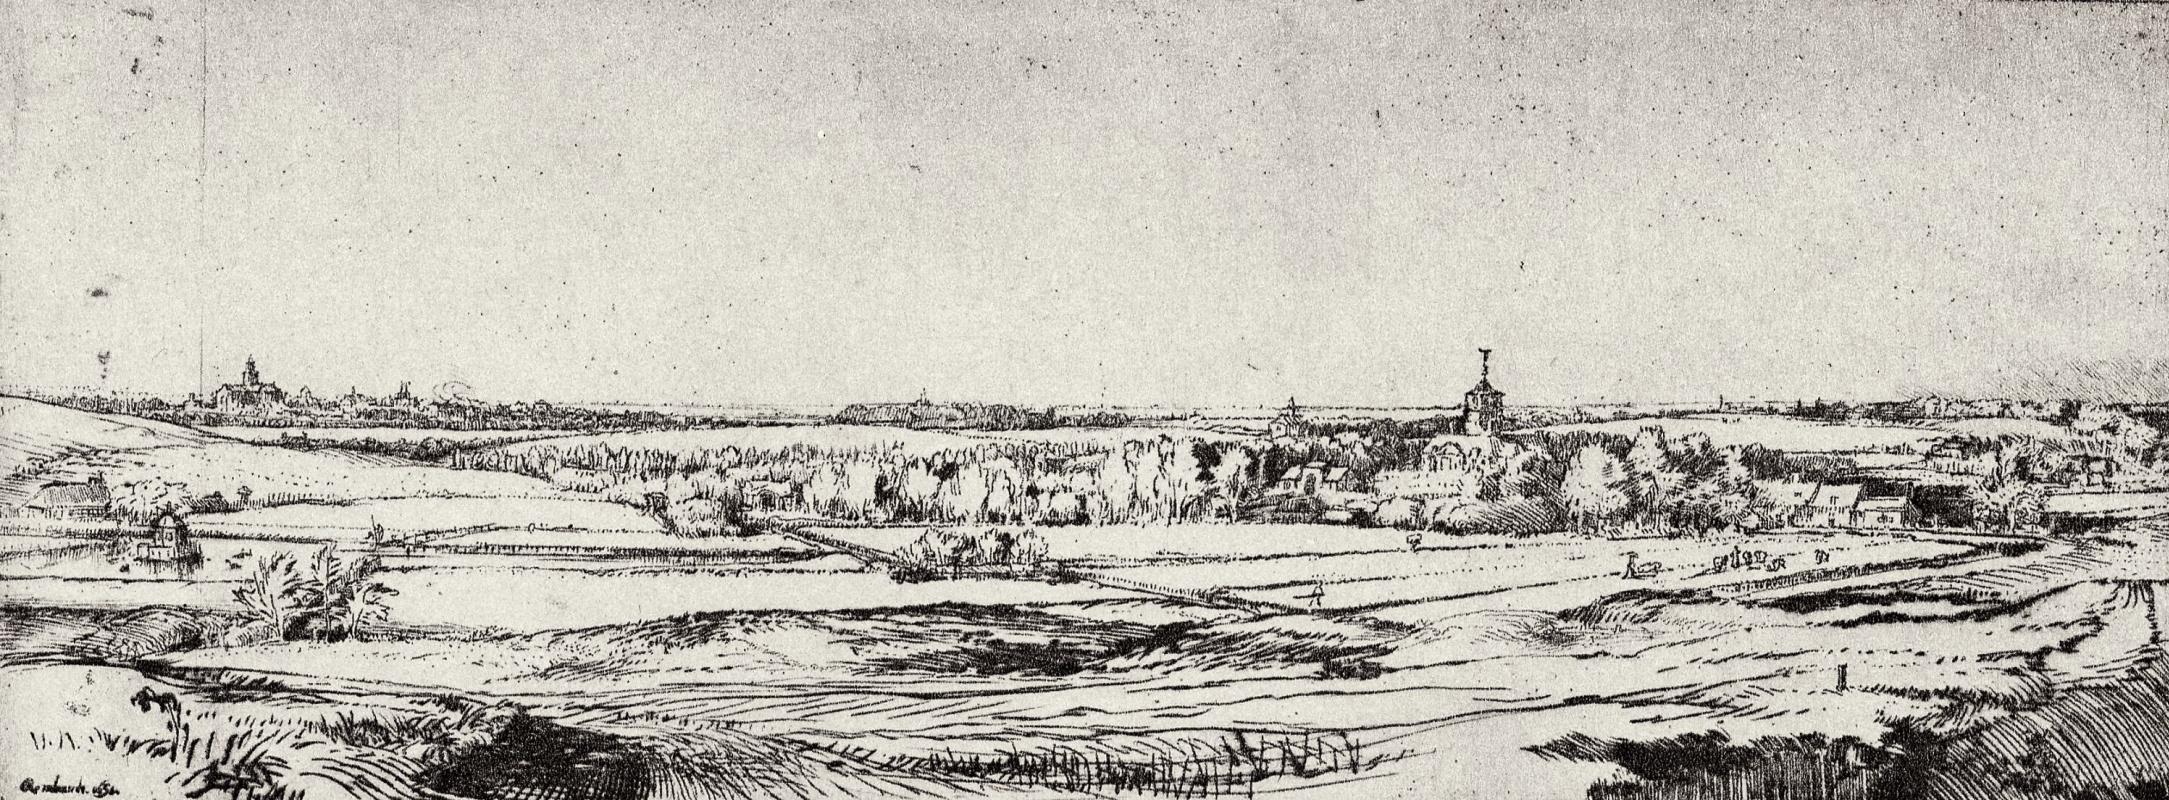 Рембрандт Харменс ван Рейн. Поместье взвешивателя золота